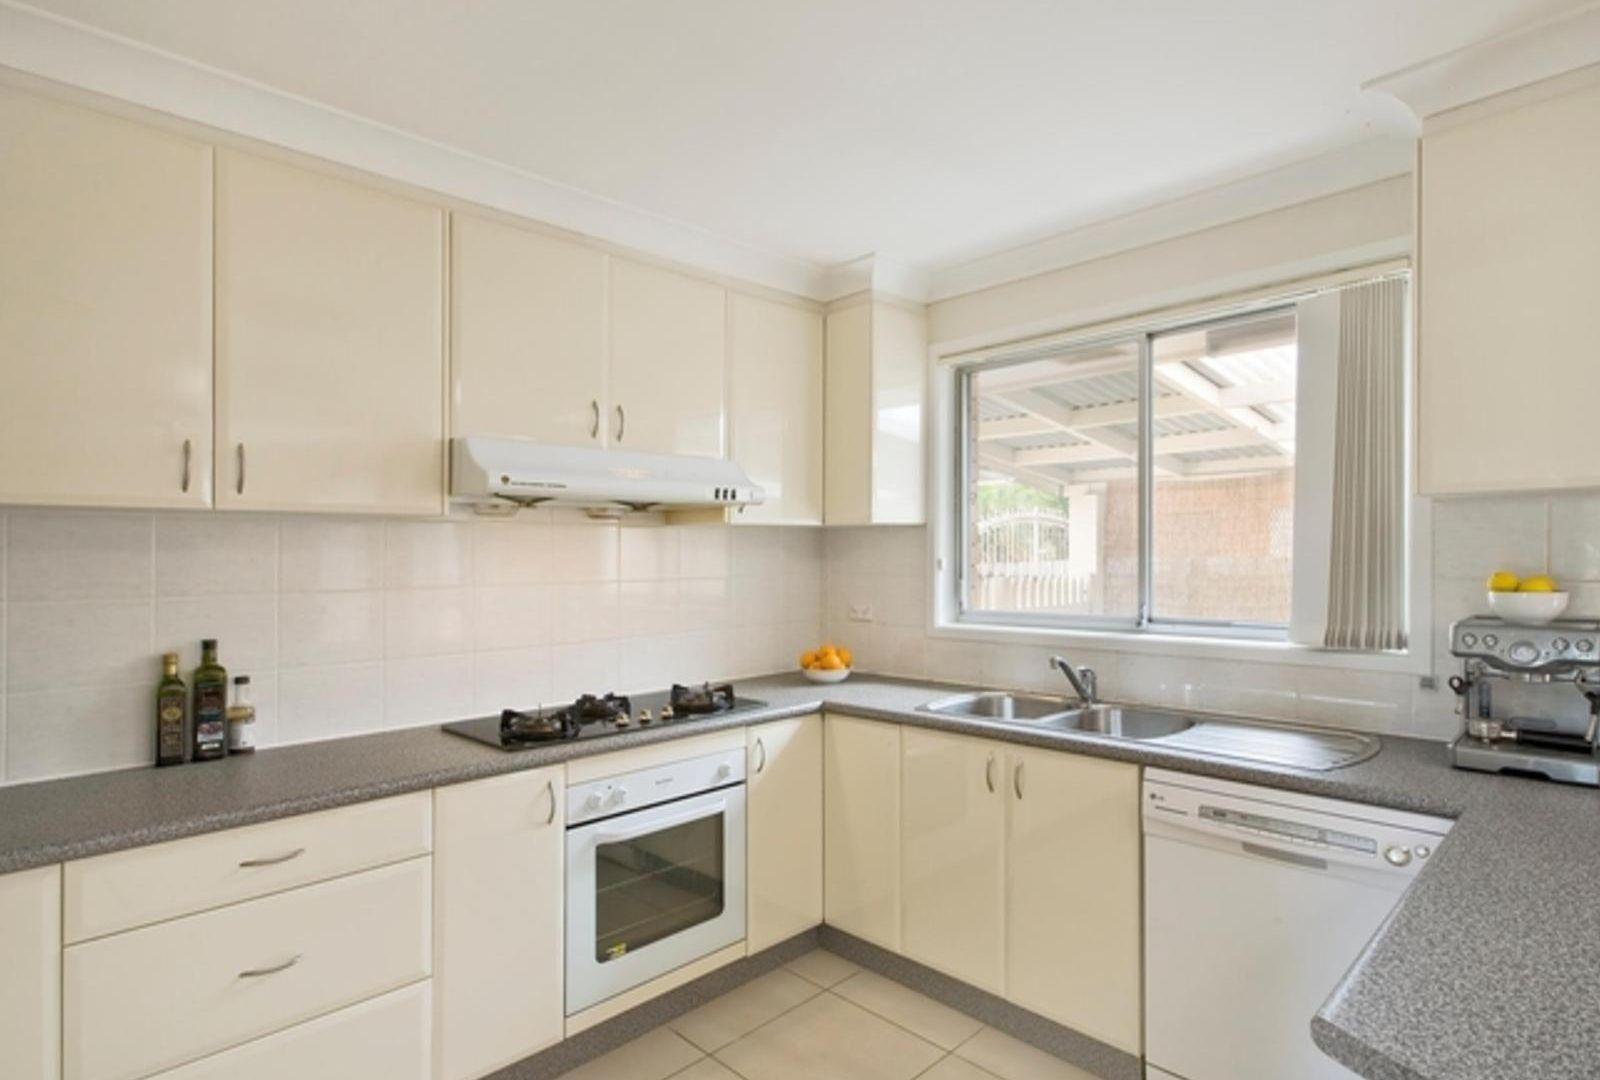 35 Justine Avenue, Baulkham Hills NSW 2153, Image 2